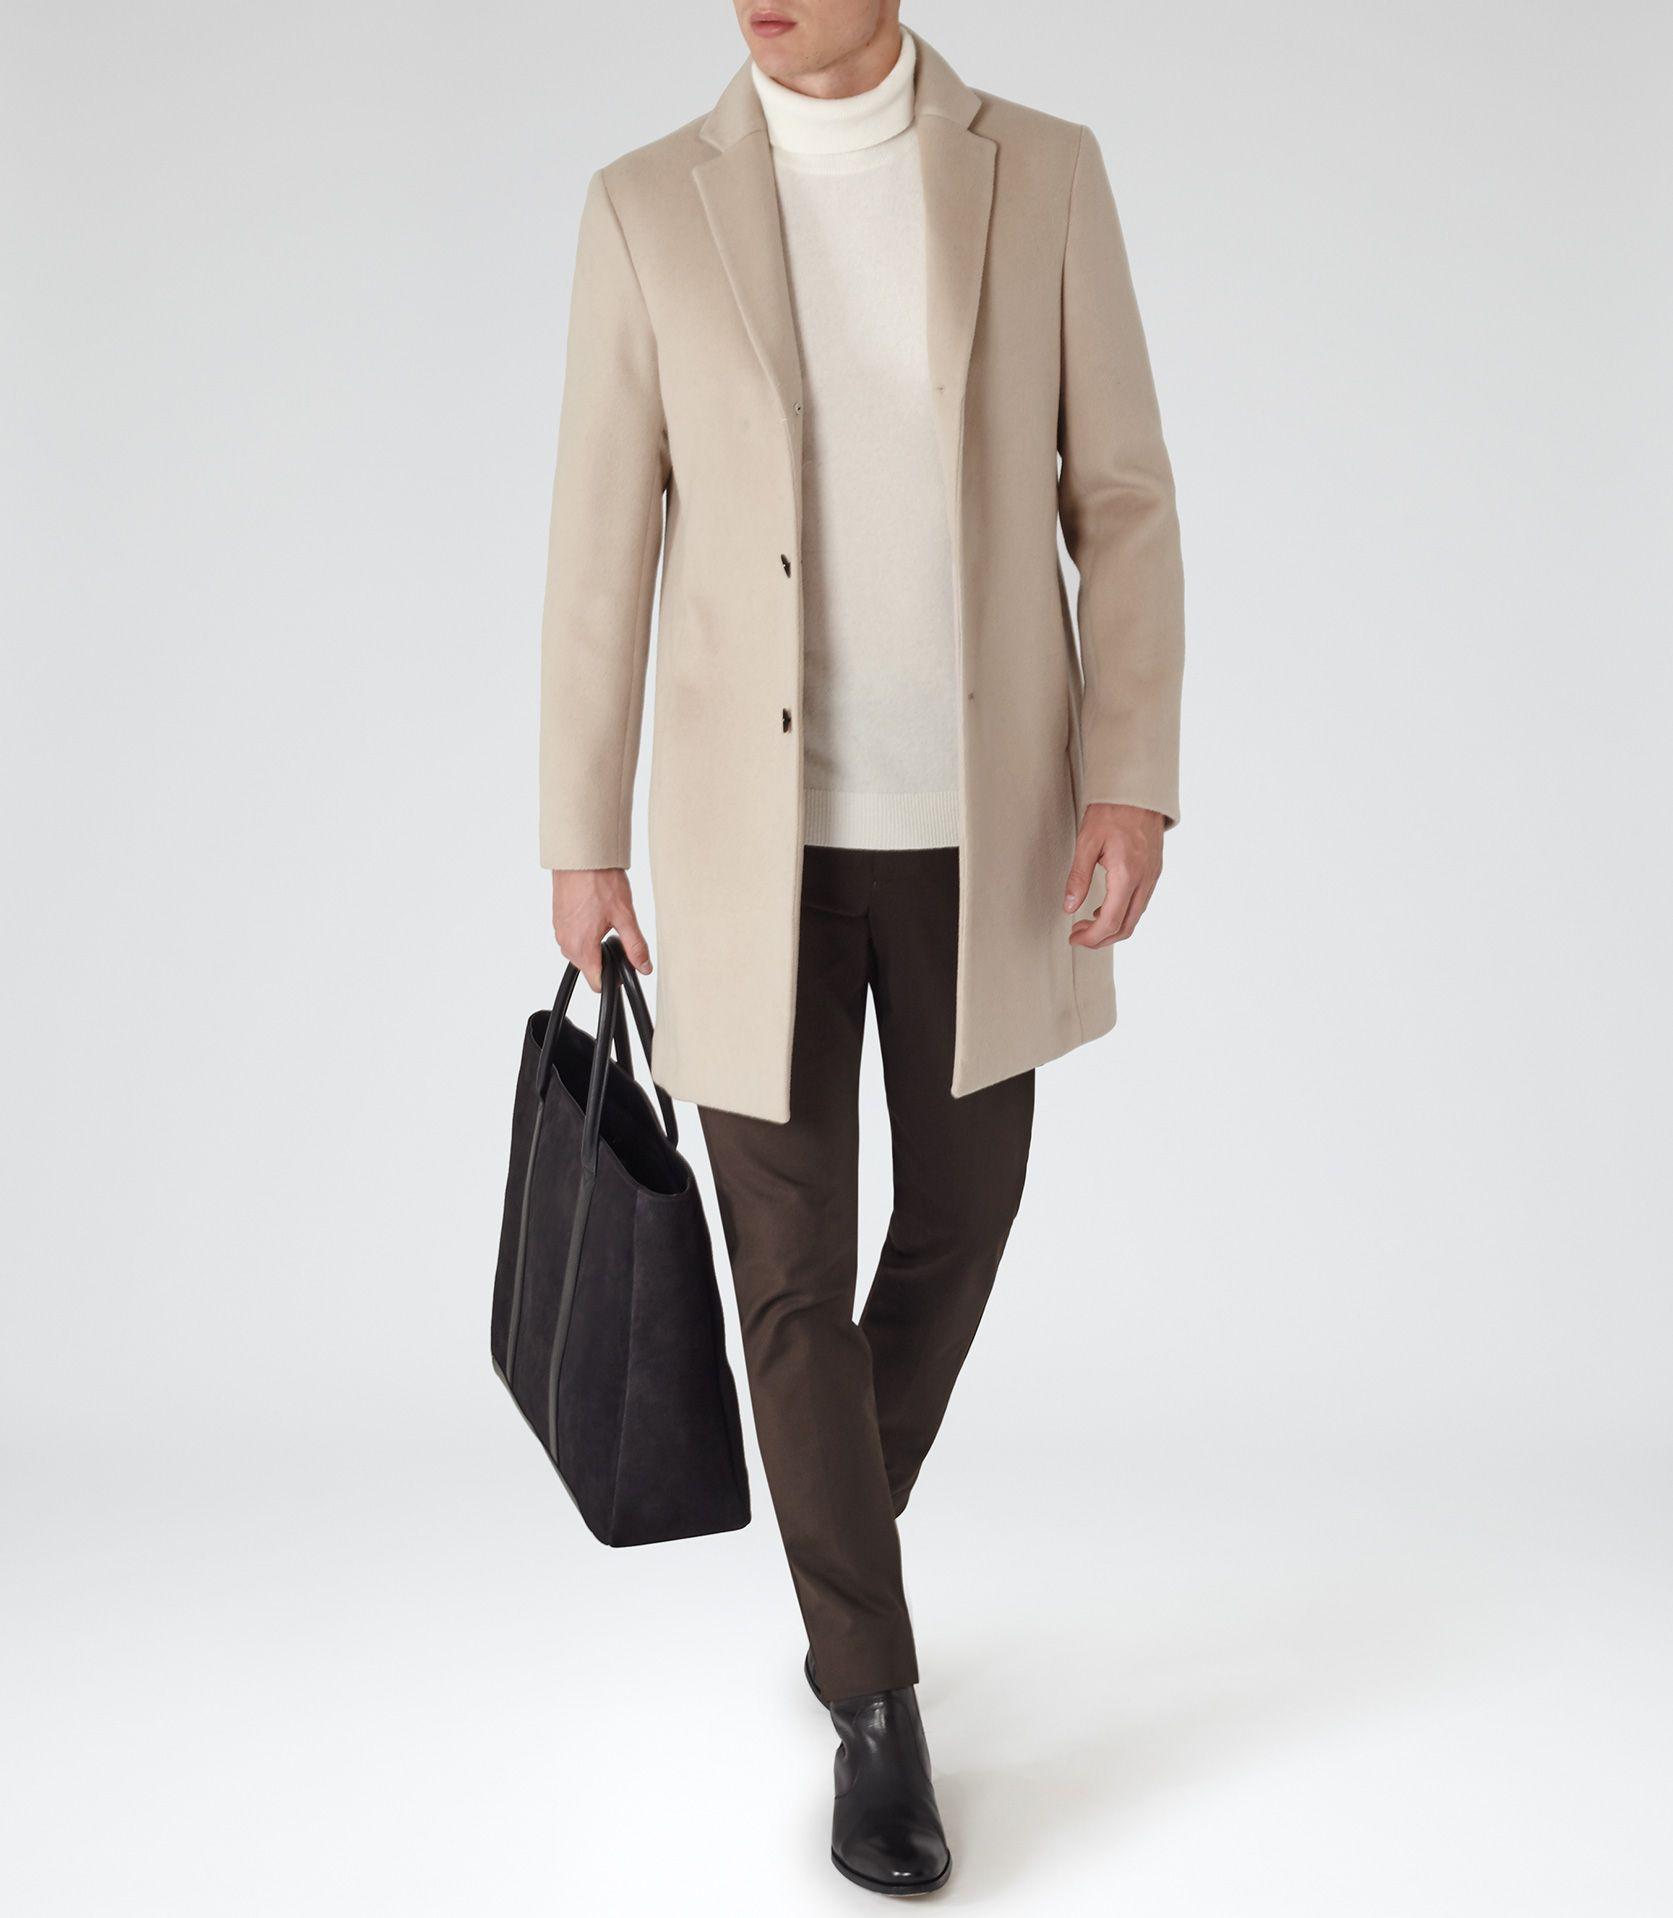 Mens jacket camel - Mens Camel Wool Blend Epsom Coat Reiss Gabriel